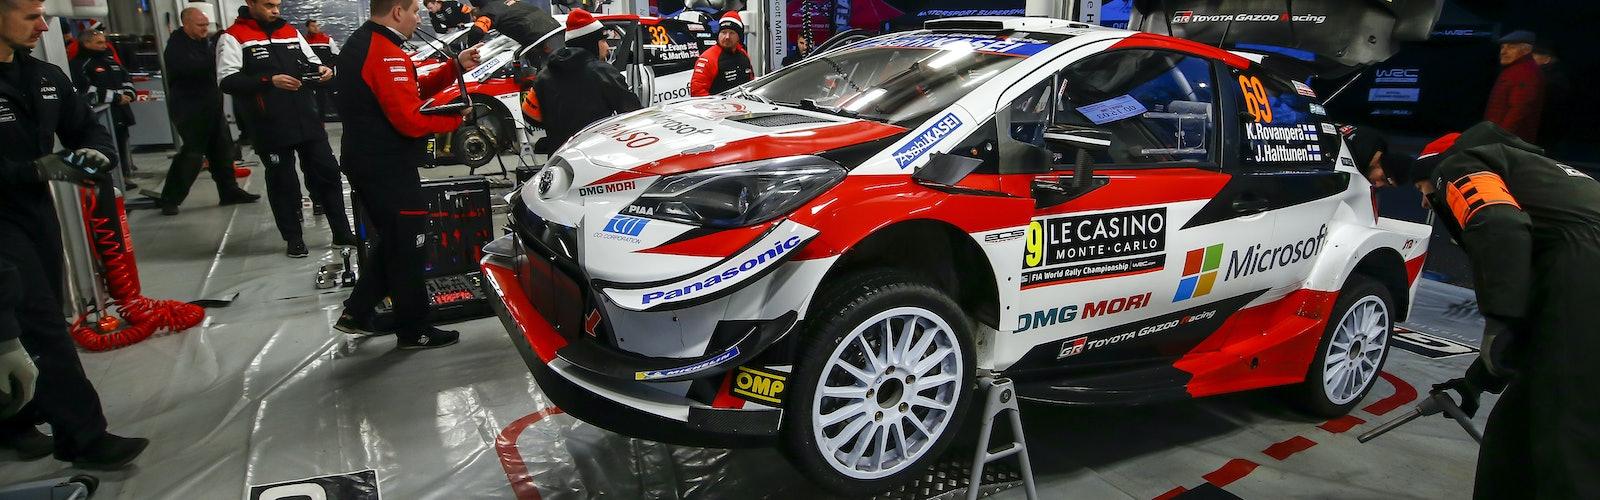 WRC_2020_Rd.1_261